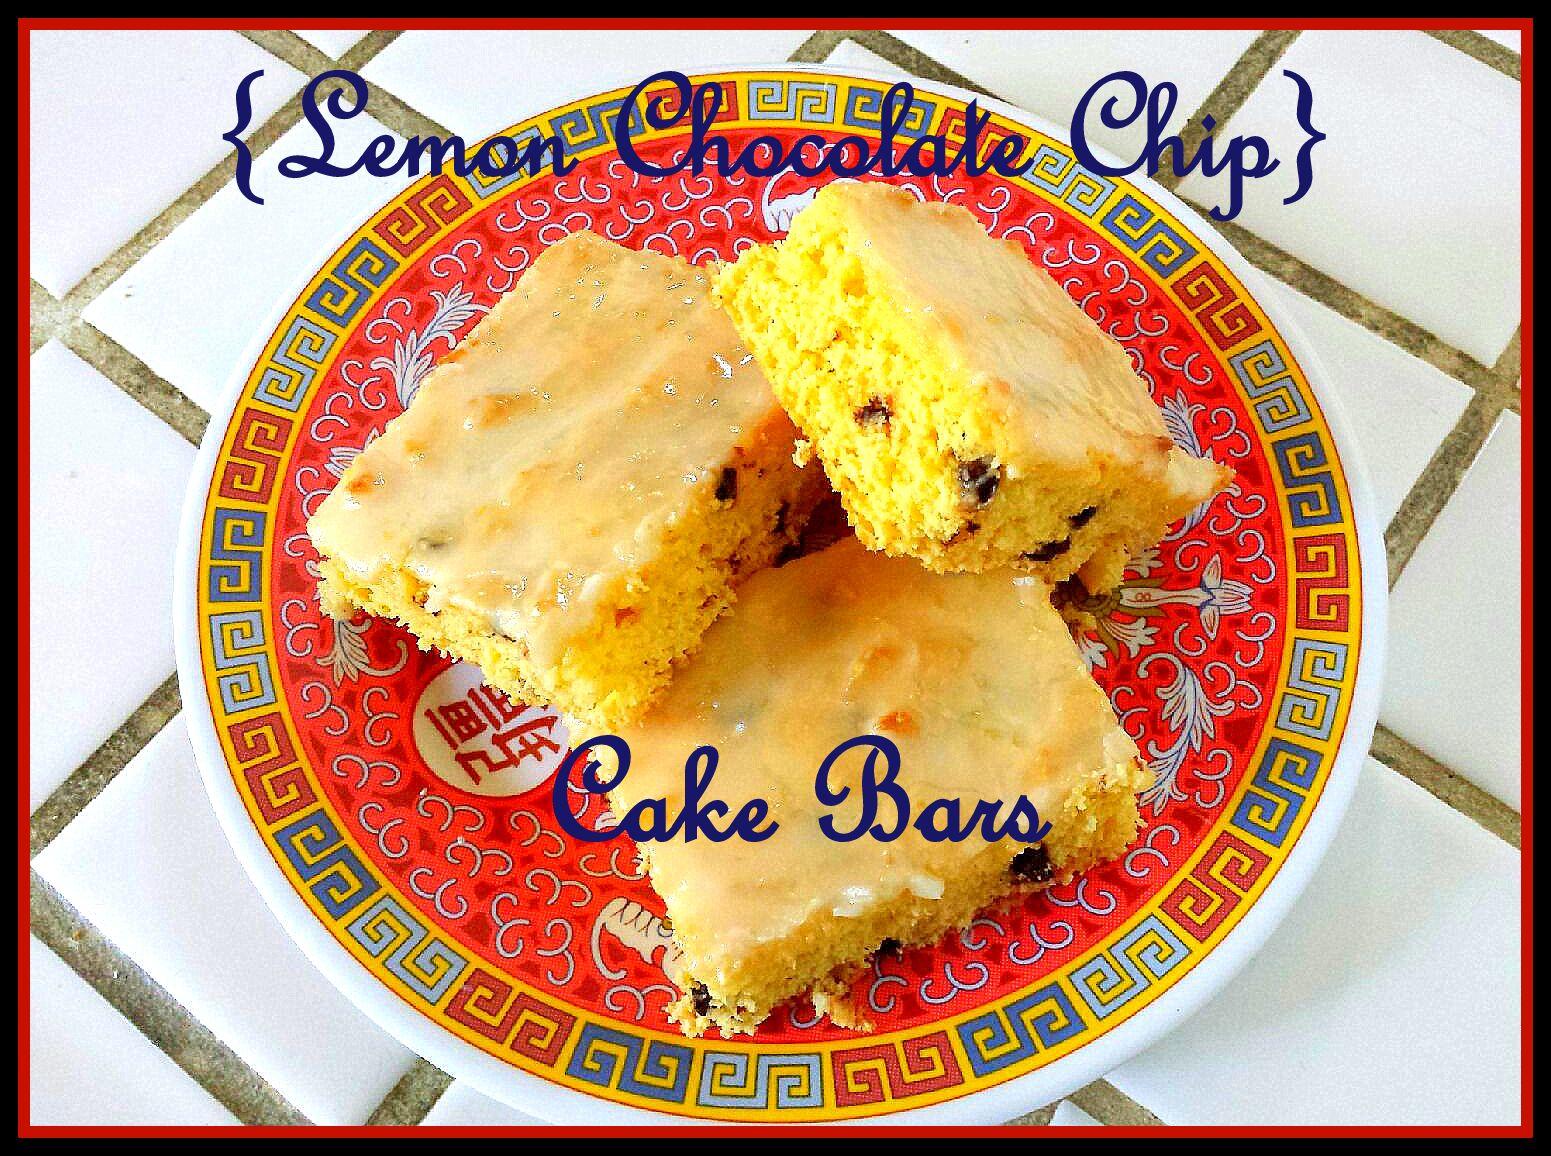 ... , Cancer: Something Sweet: Low Fat Lemon Chocolate Chip Cake Bars